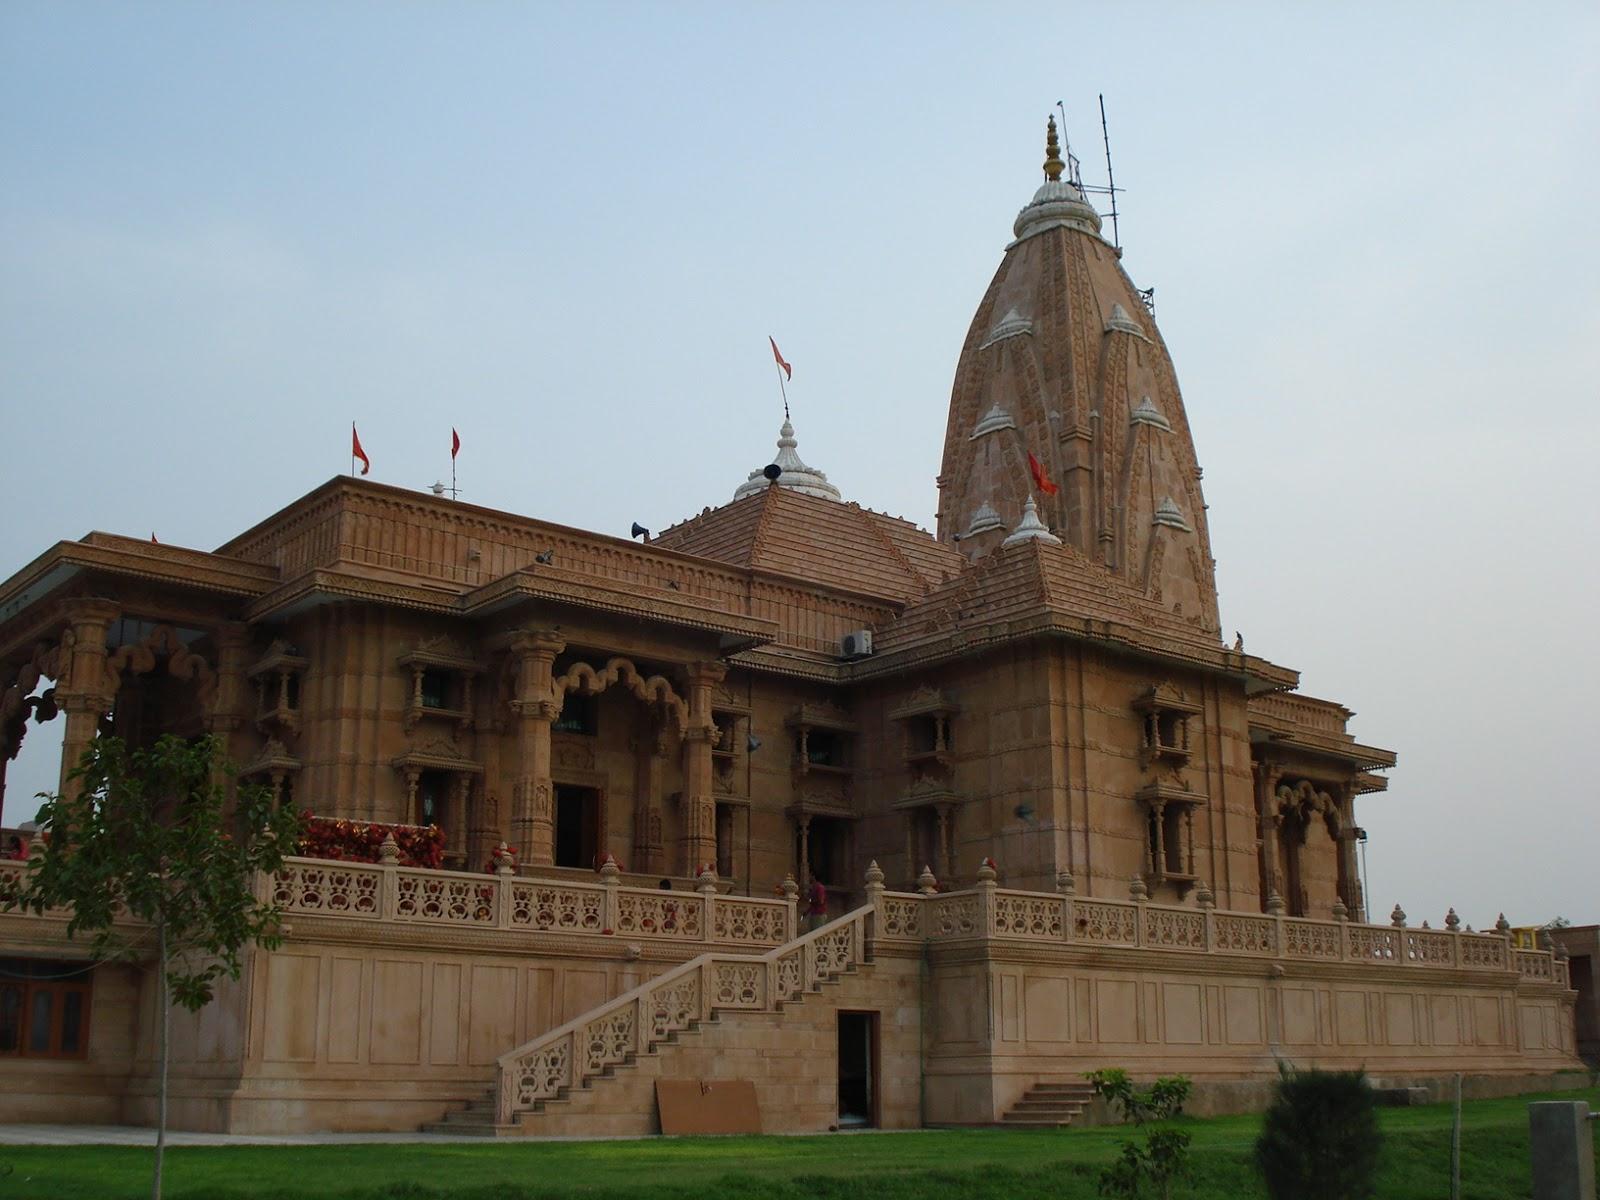 Hanumangarh India  city images : ... India: India Travel Sardarsahar Hanumangarh Rajasthan India